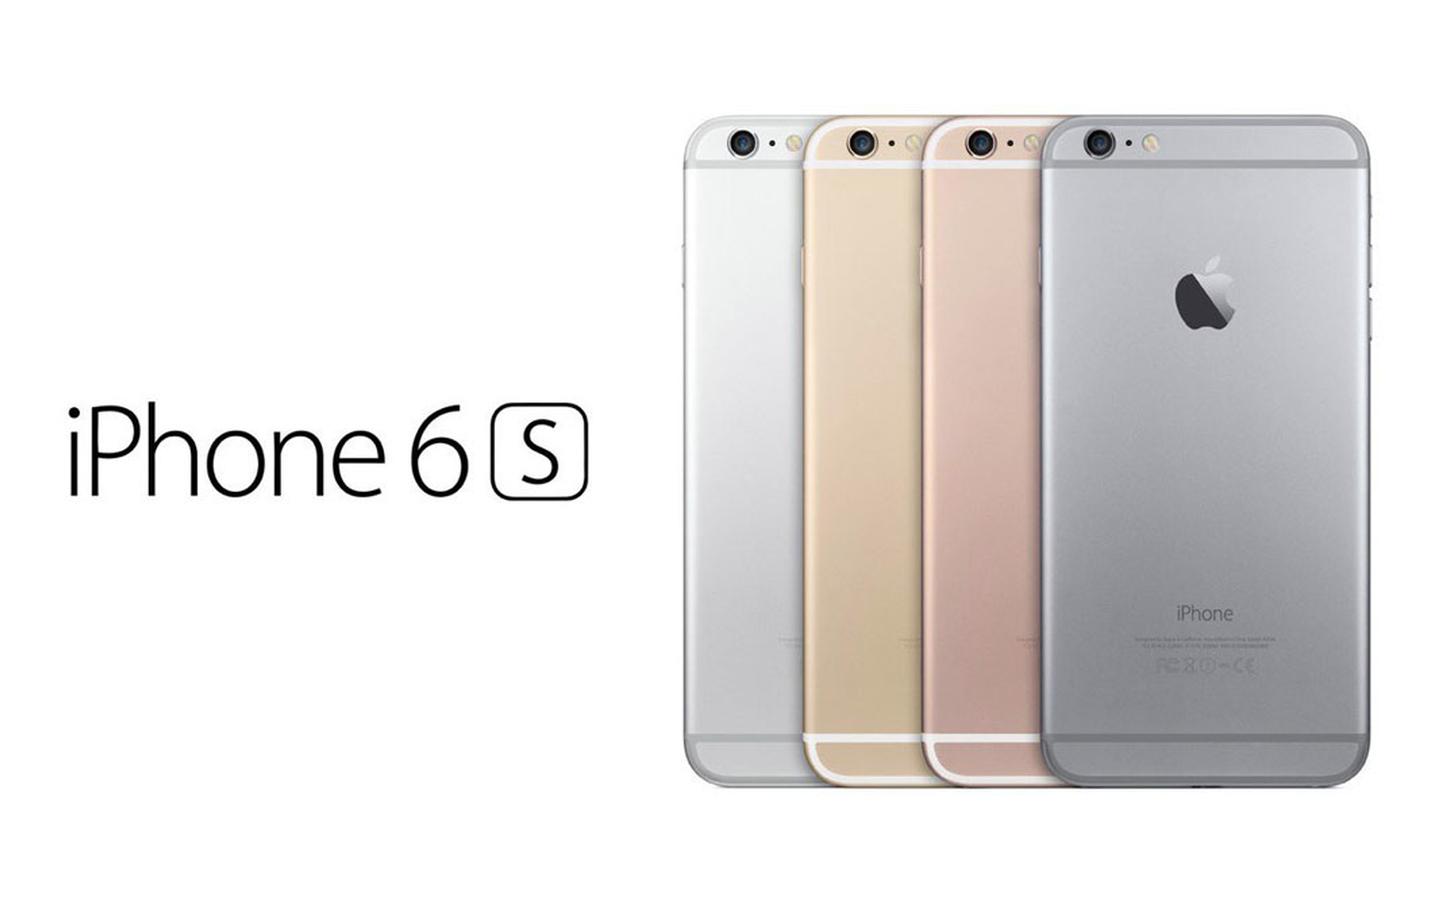 iphone6s.jpg